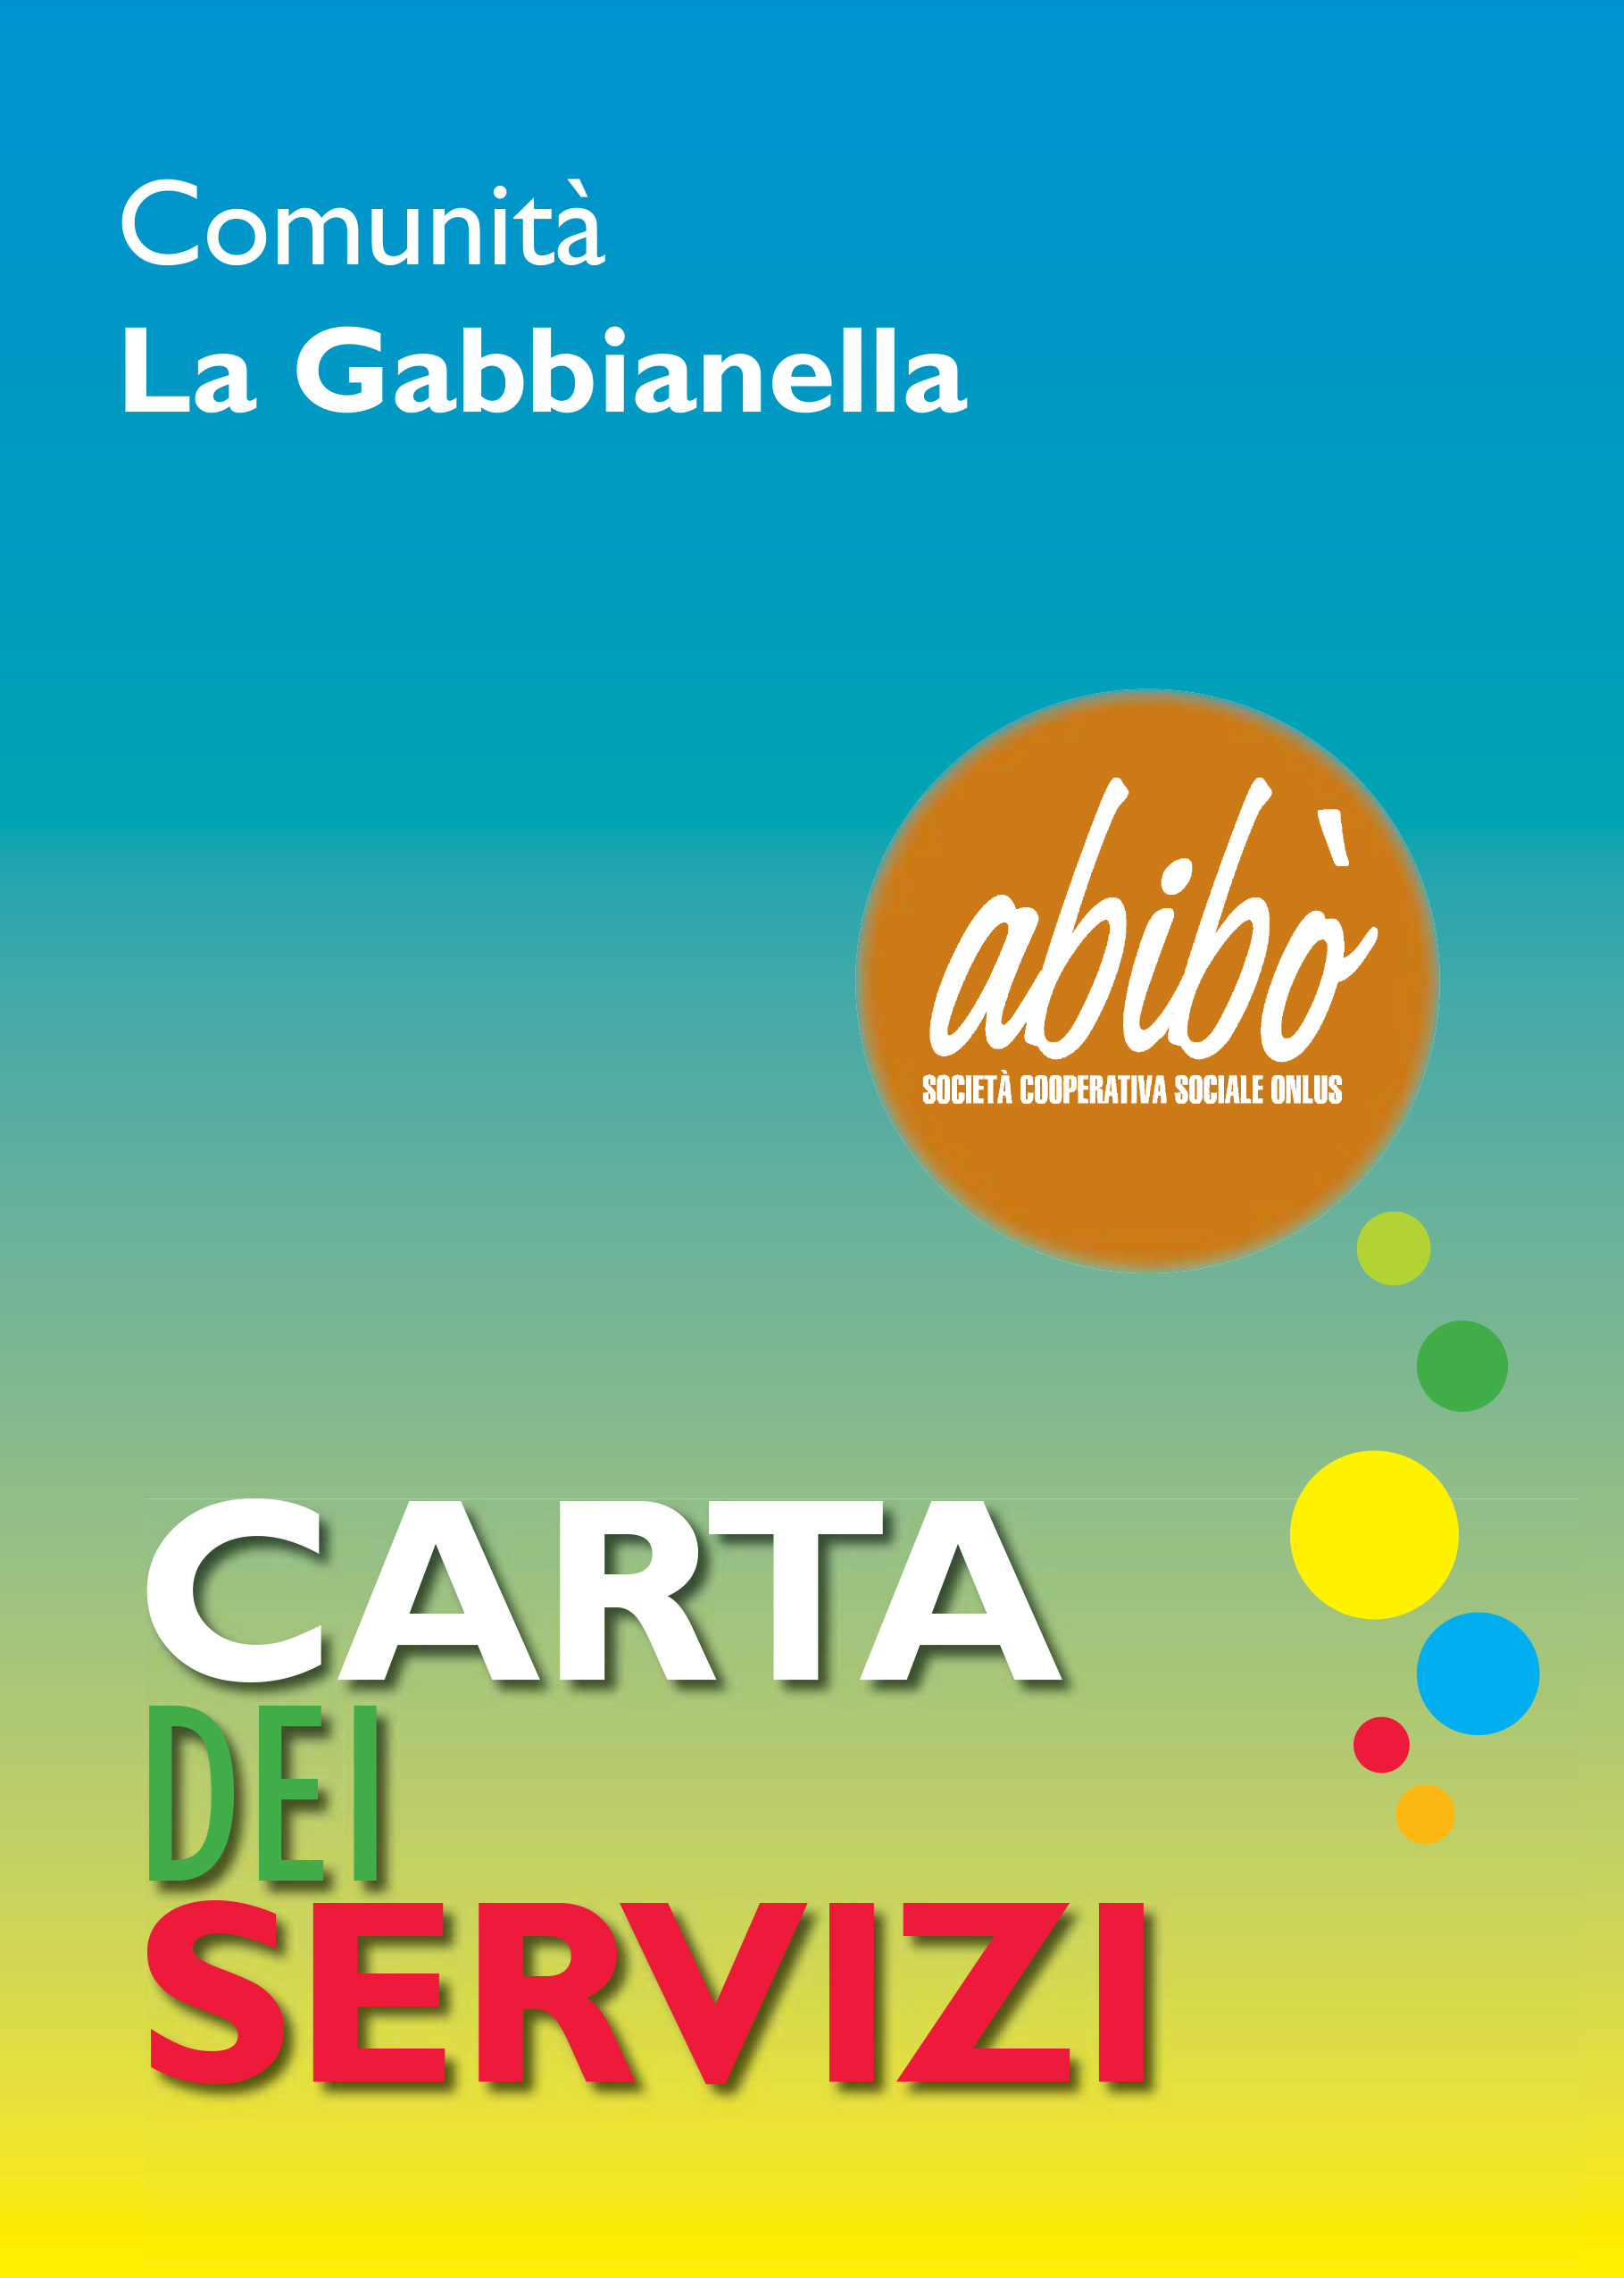 carta_servizi_2015_Abibo